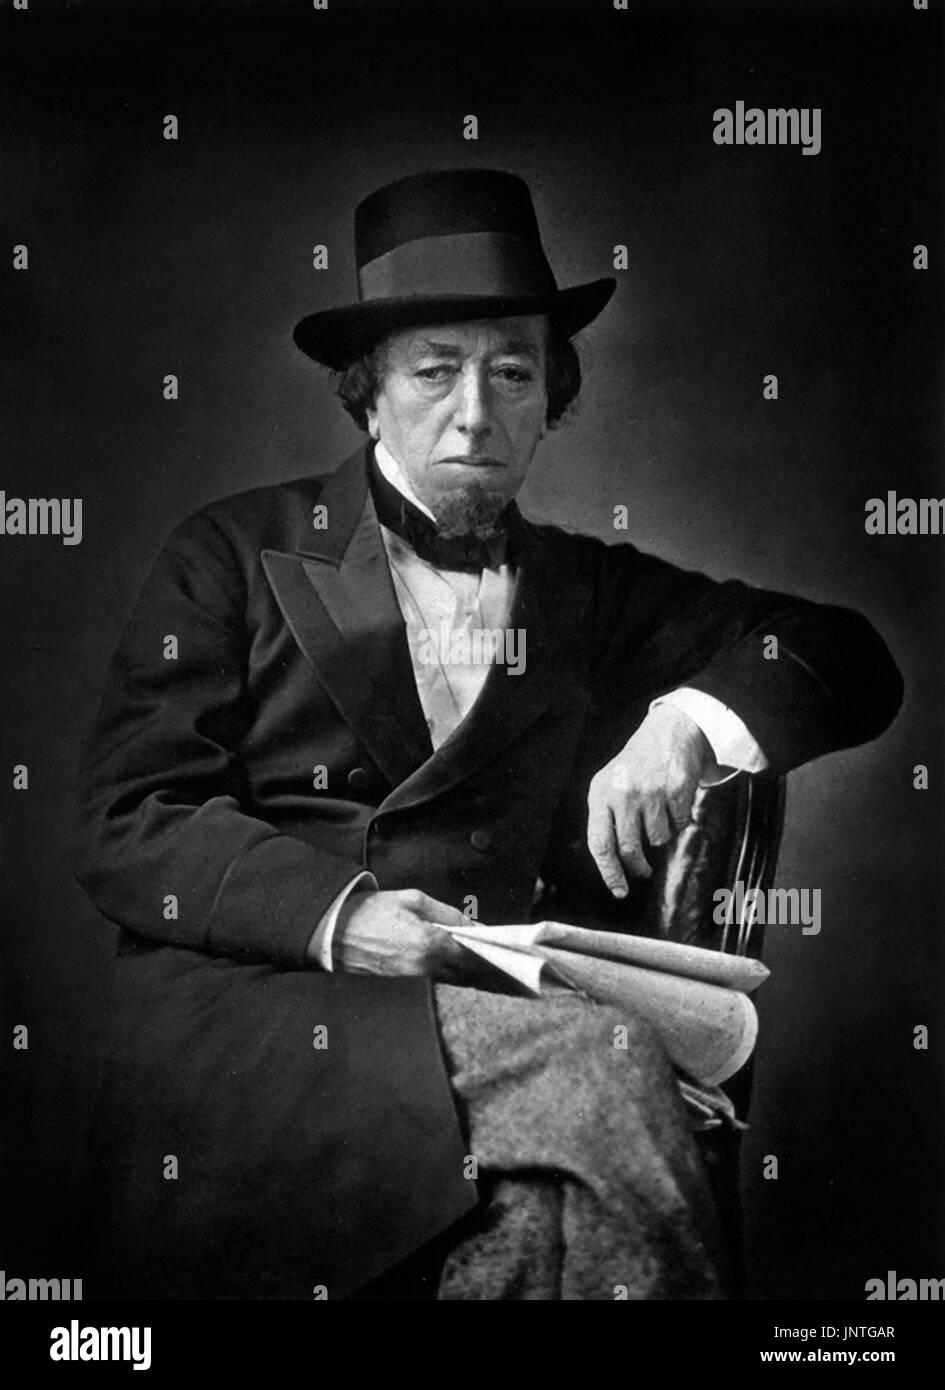 Disraeli. Portrait of British Prime Minister Benjamin Disraeli, 1st Earl of Beaconsfield (1804-1881), photograph 1878 Stock Photo